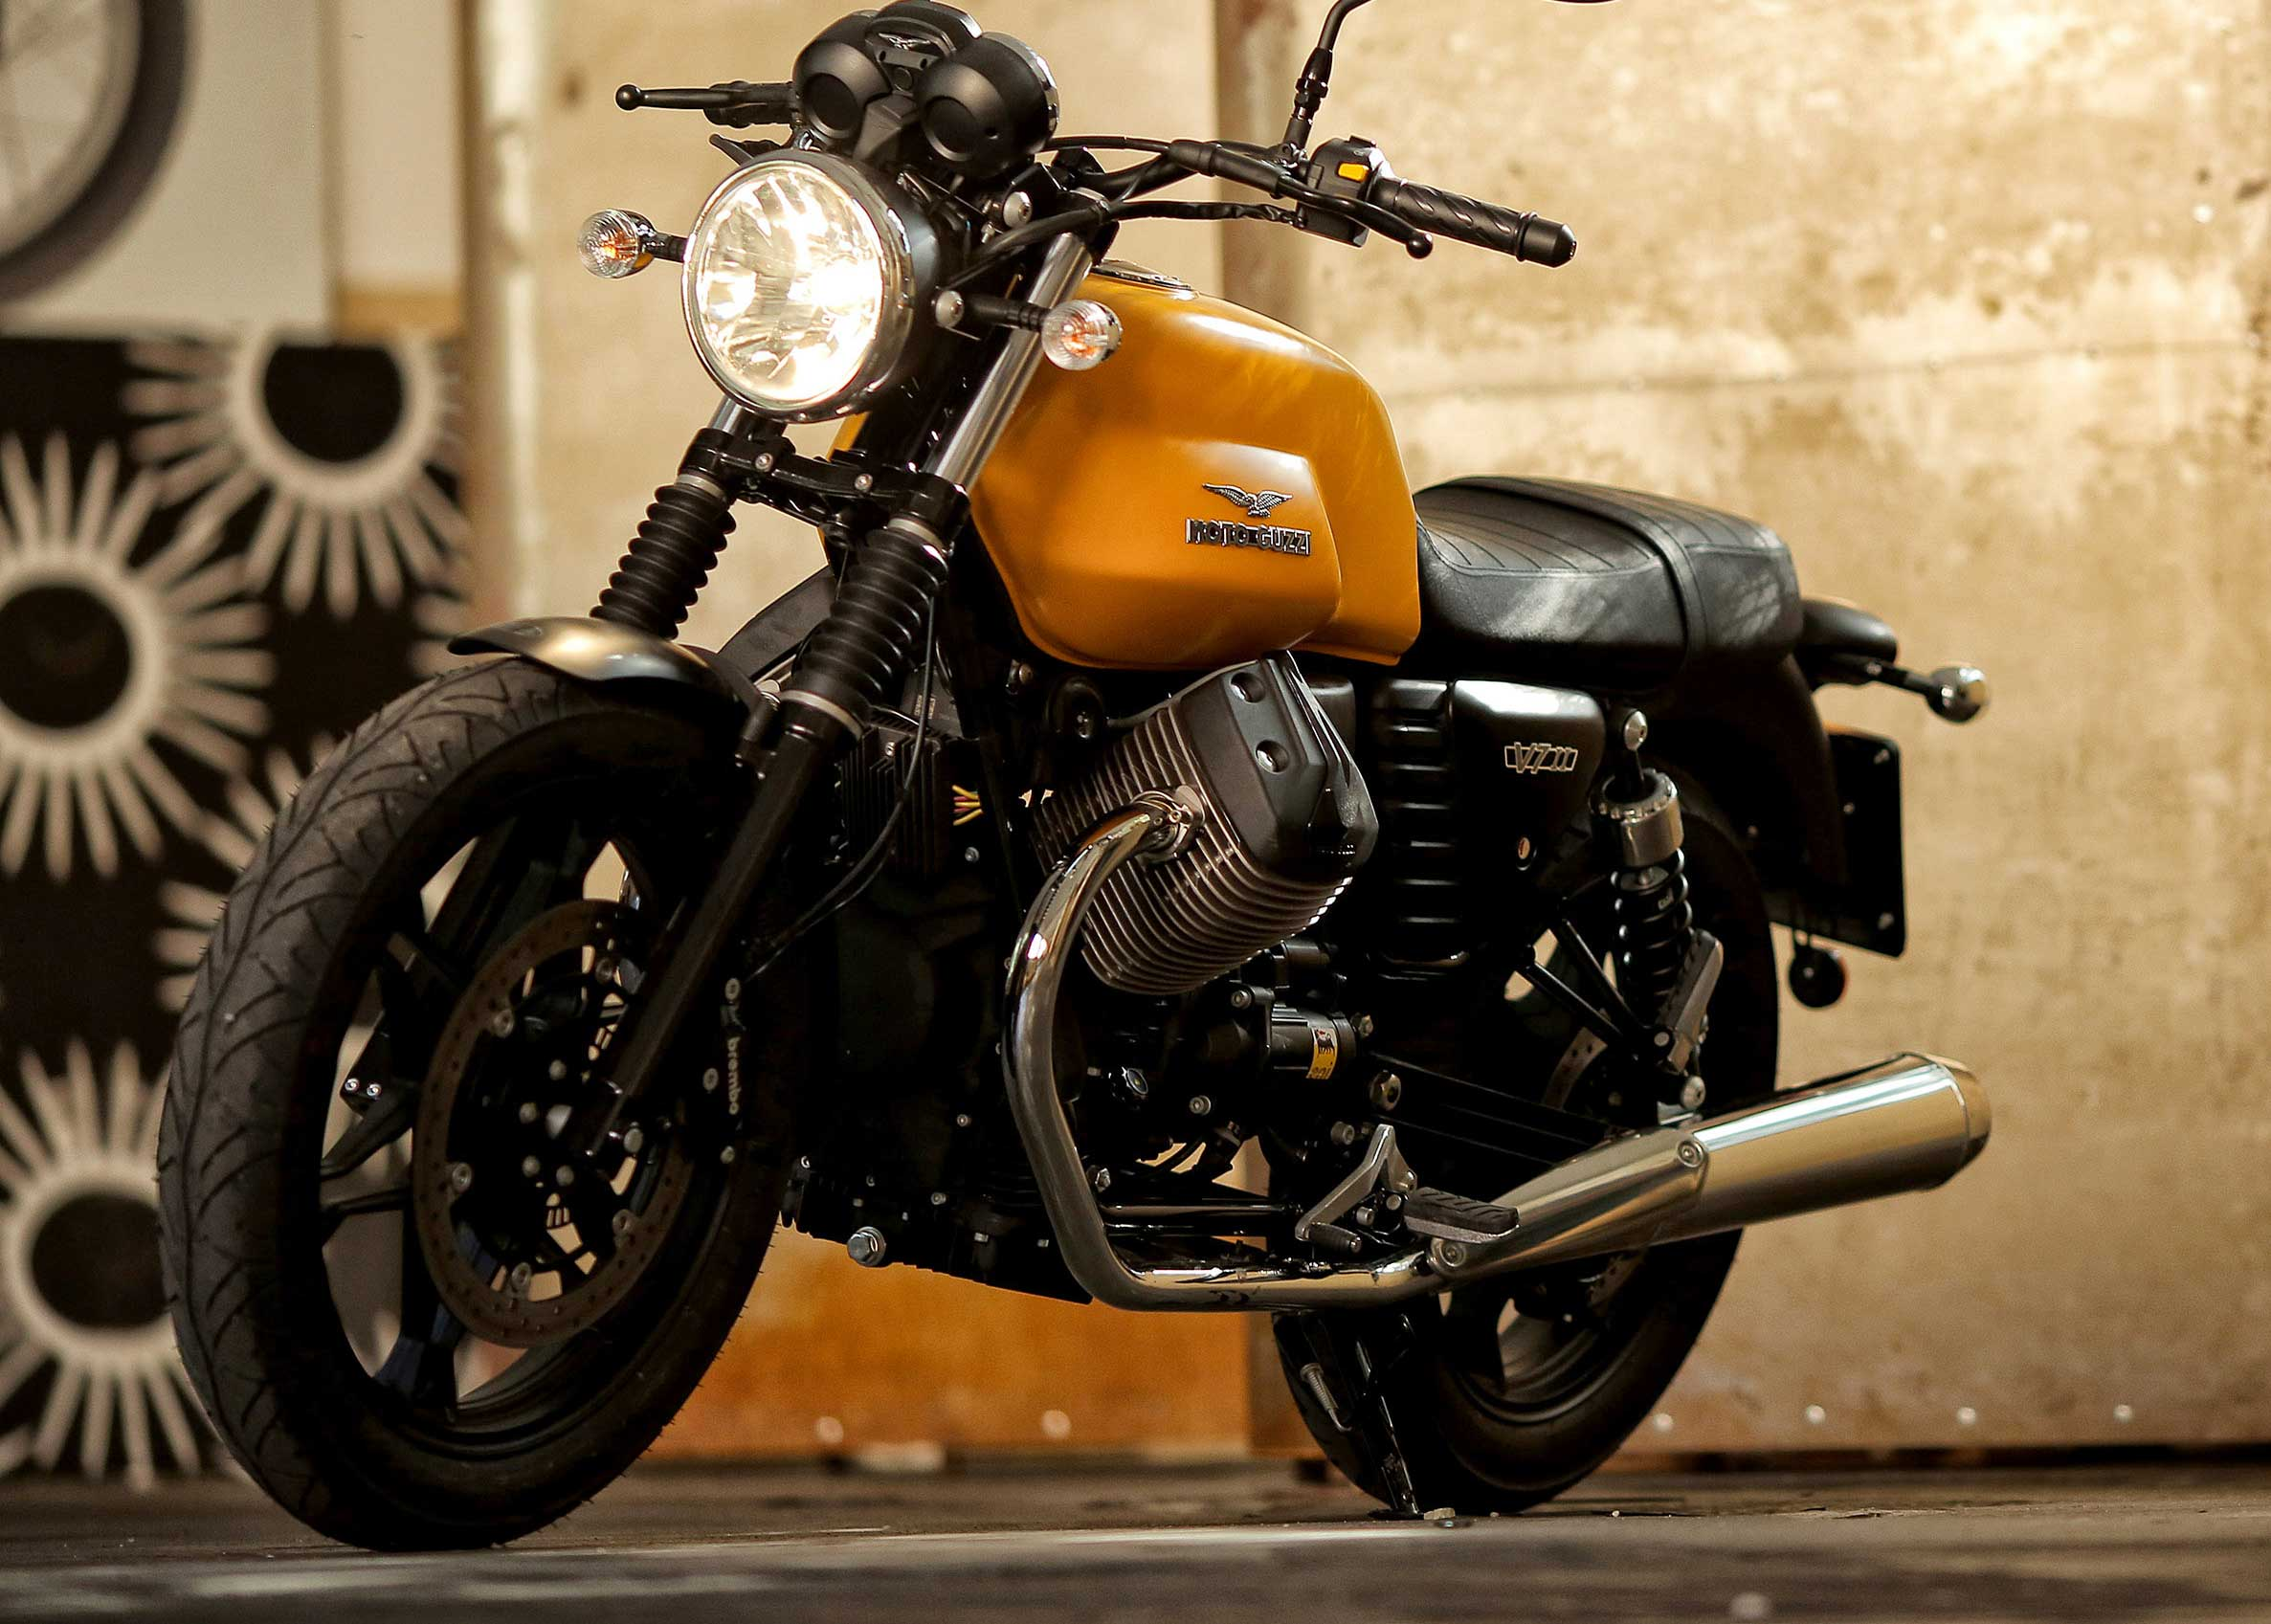 Moto modelo Stone, color negro y amarillo. Marca Motoguzzi